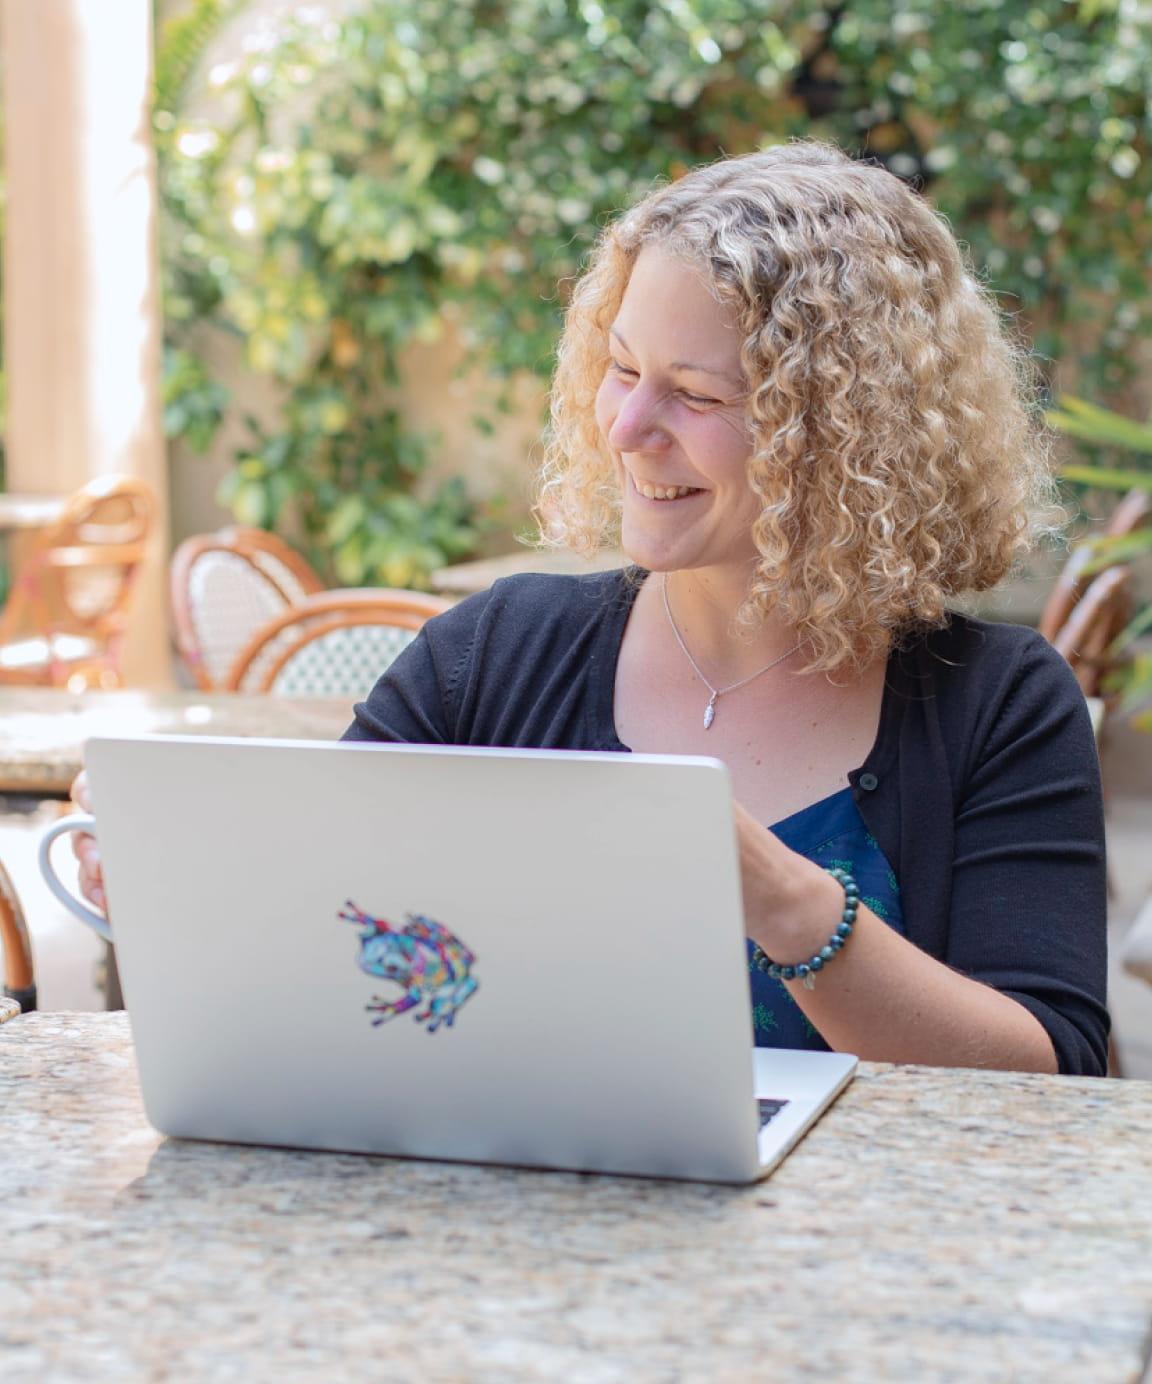 Image of Michelle, a Xolo customer